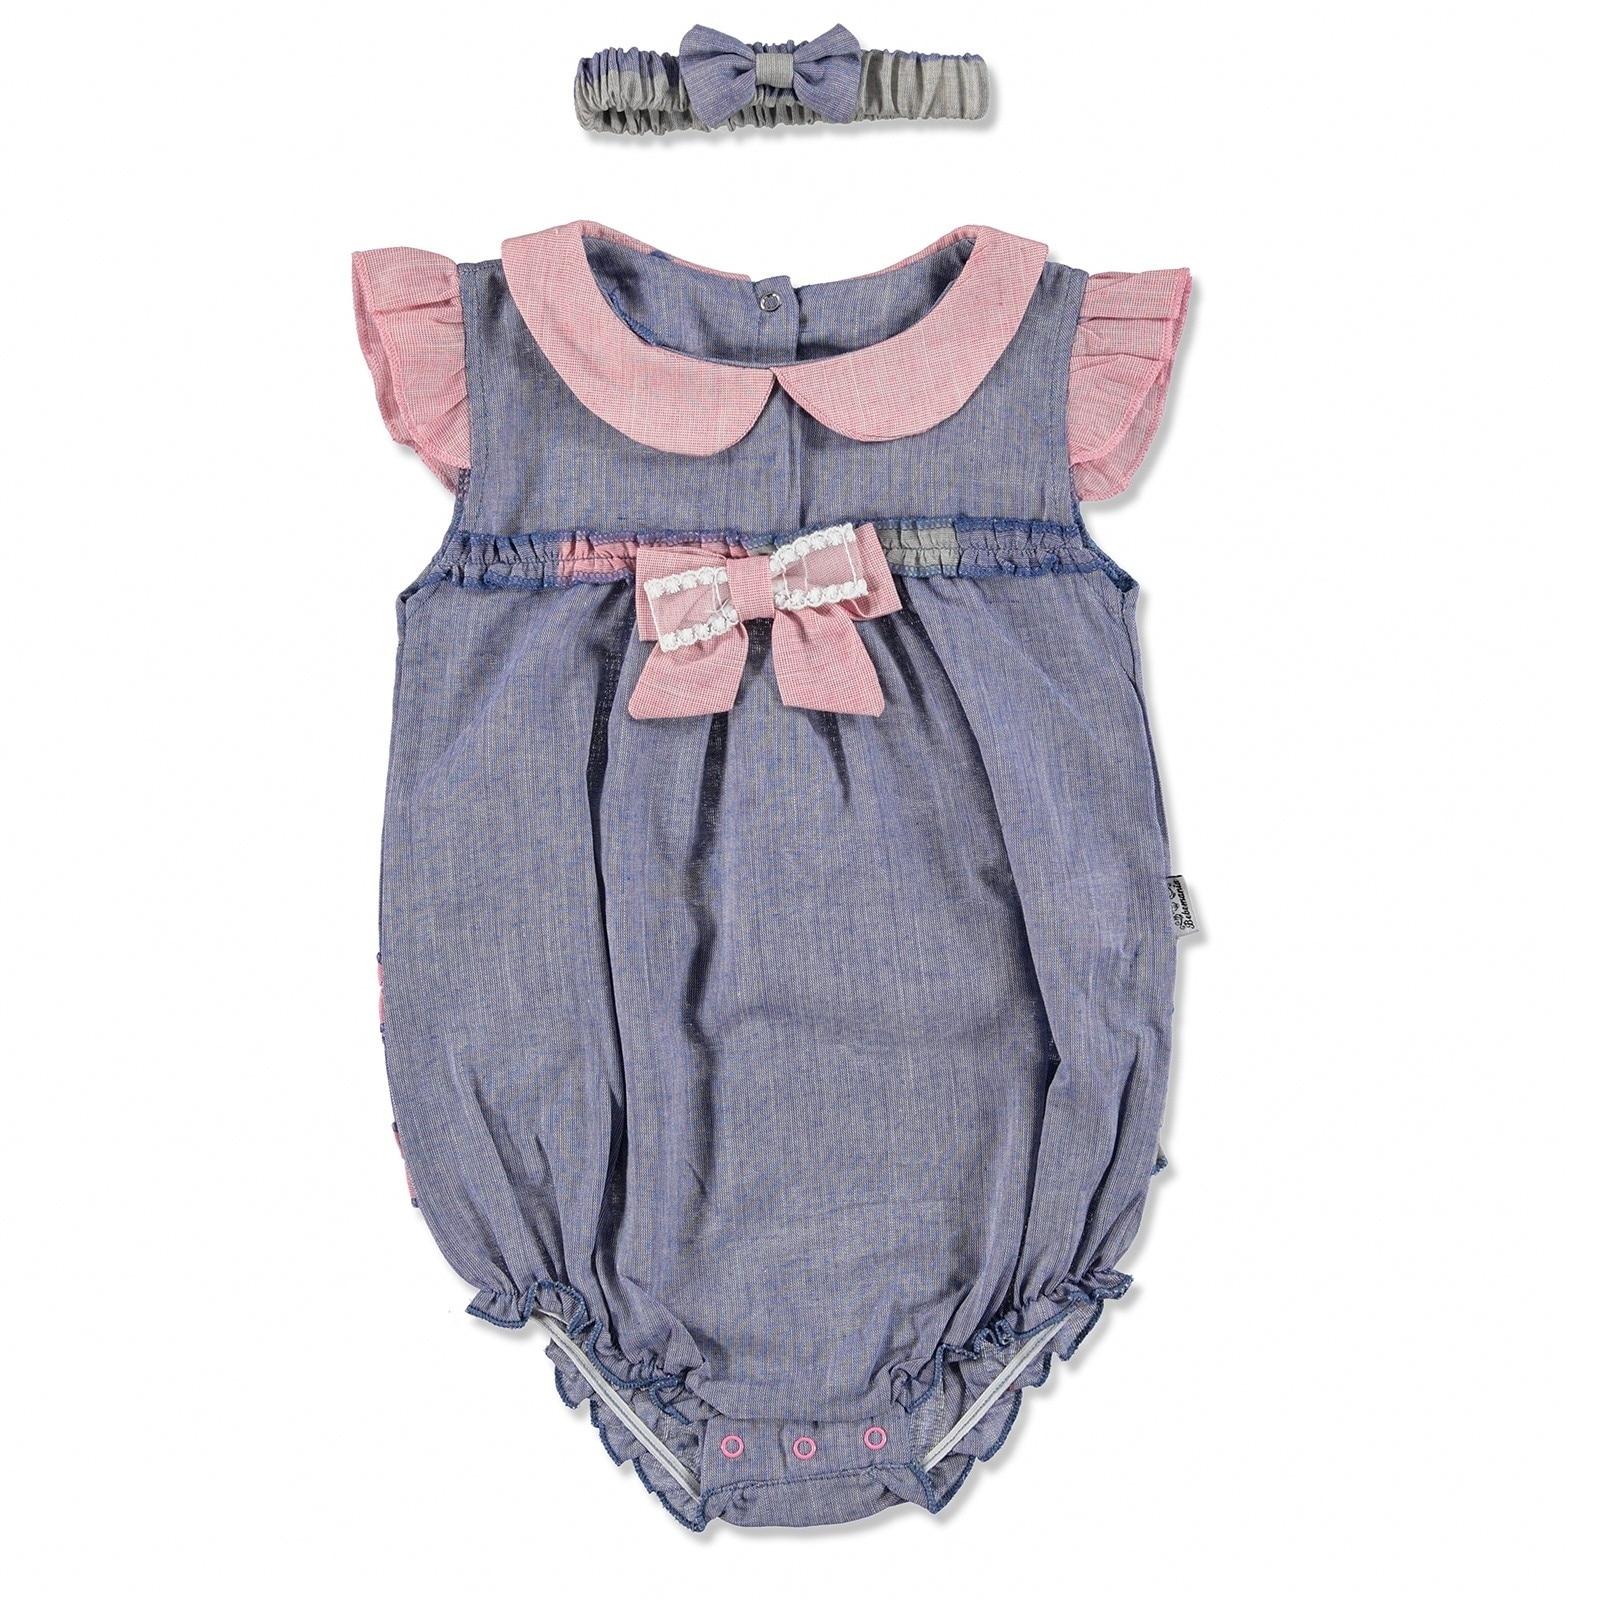 Ebebek Bebemania Summer Baby Girl Rainbow Bodysuit